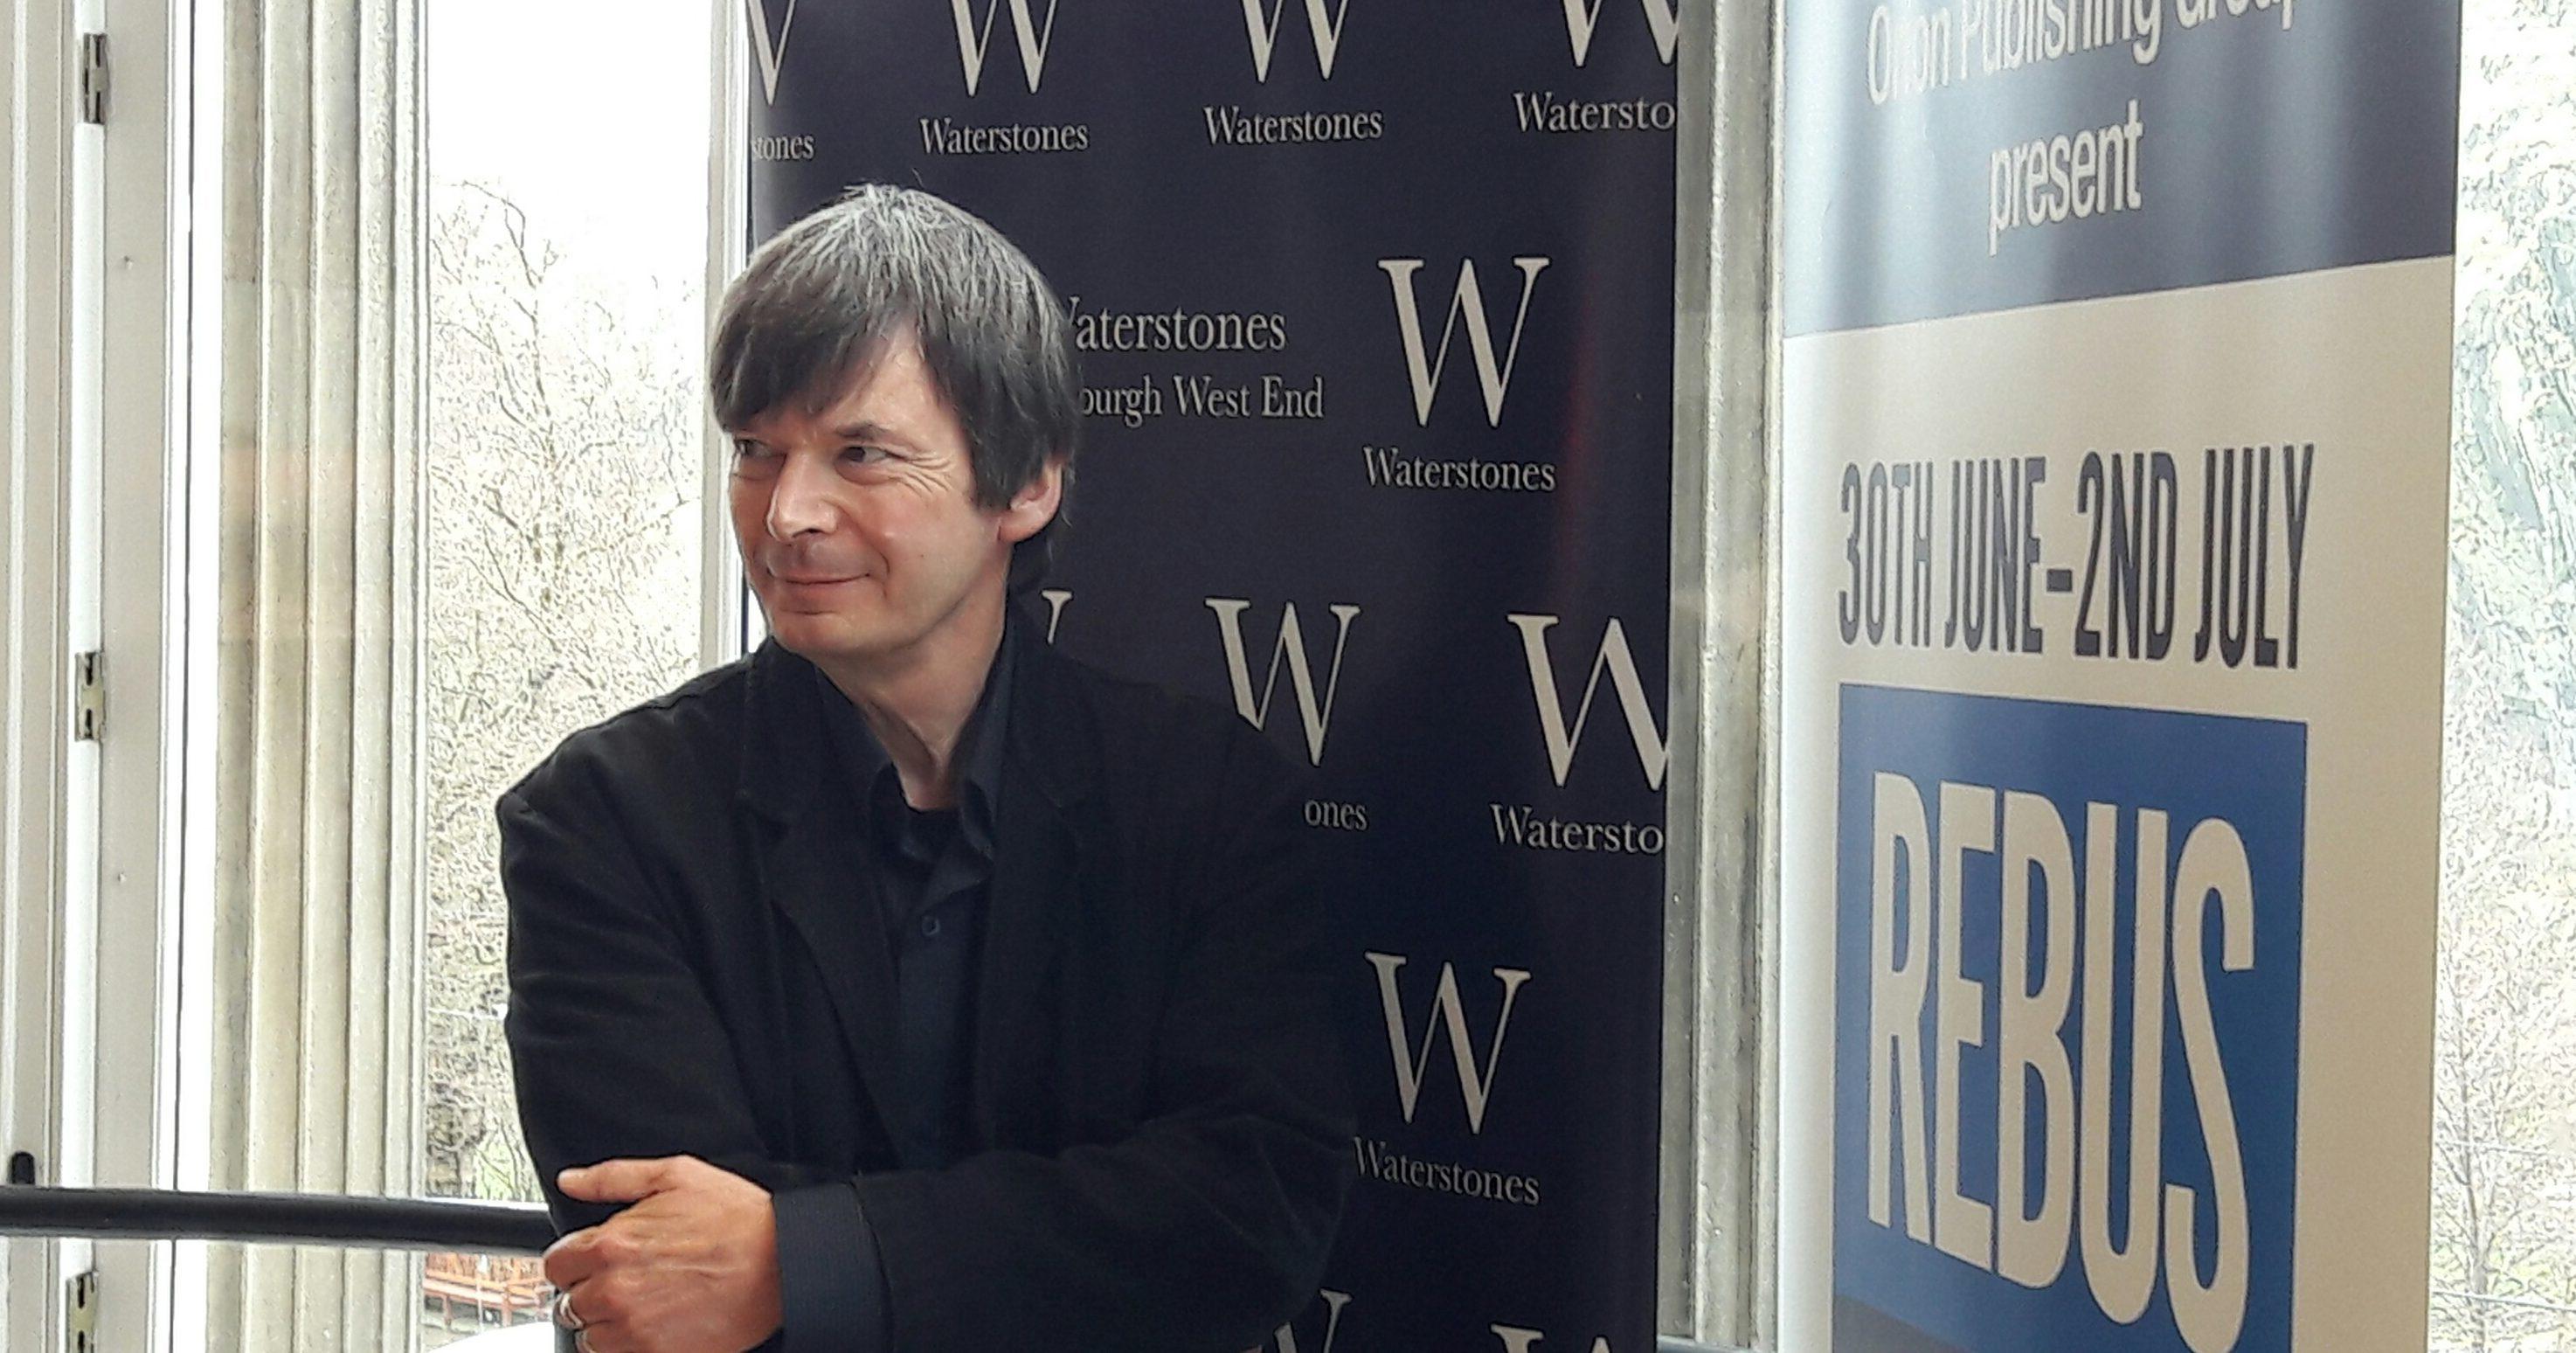 Ian Rankin at the Rebusfest launch in Edinburgh